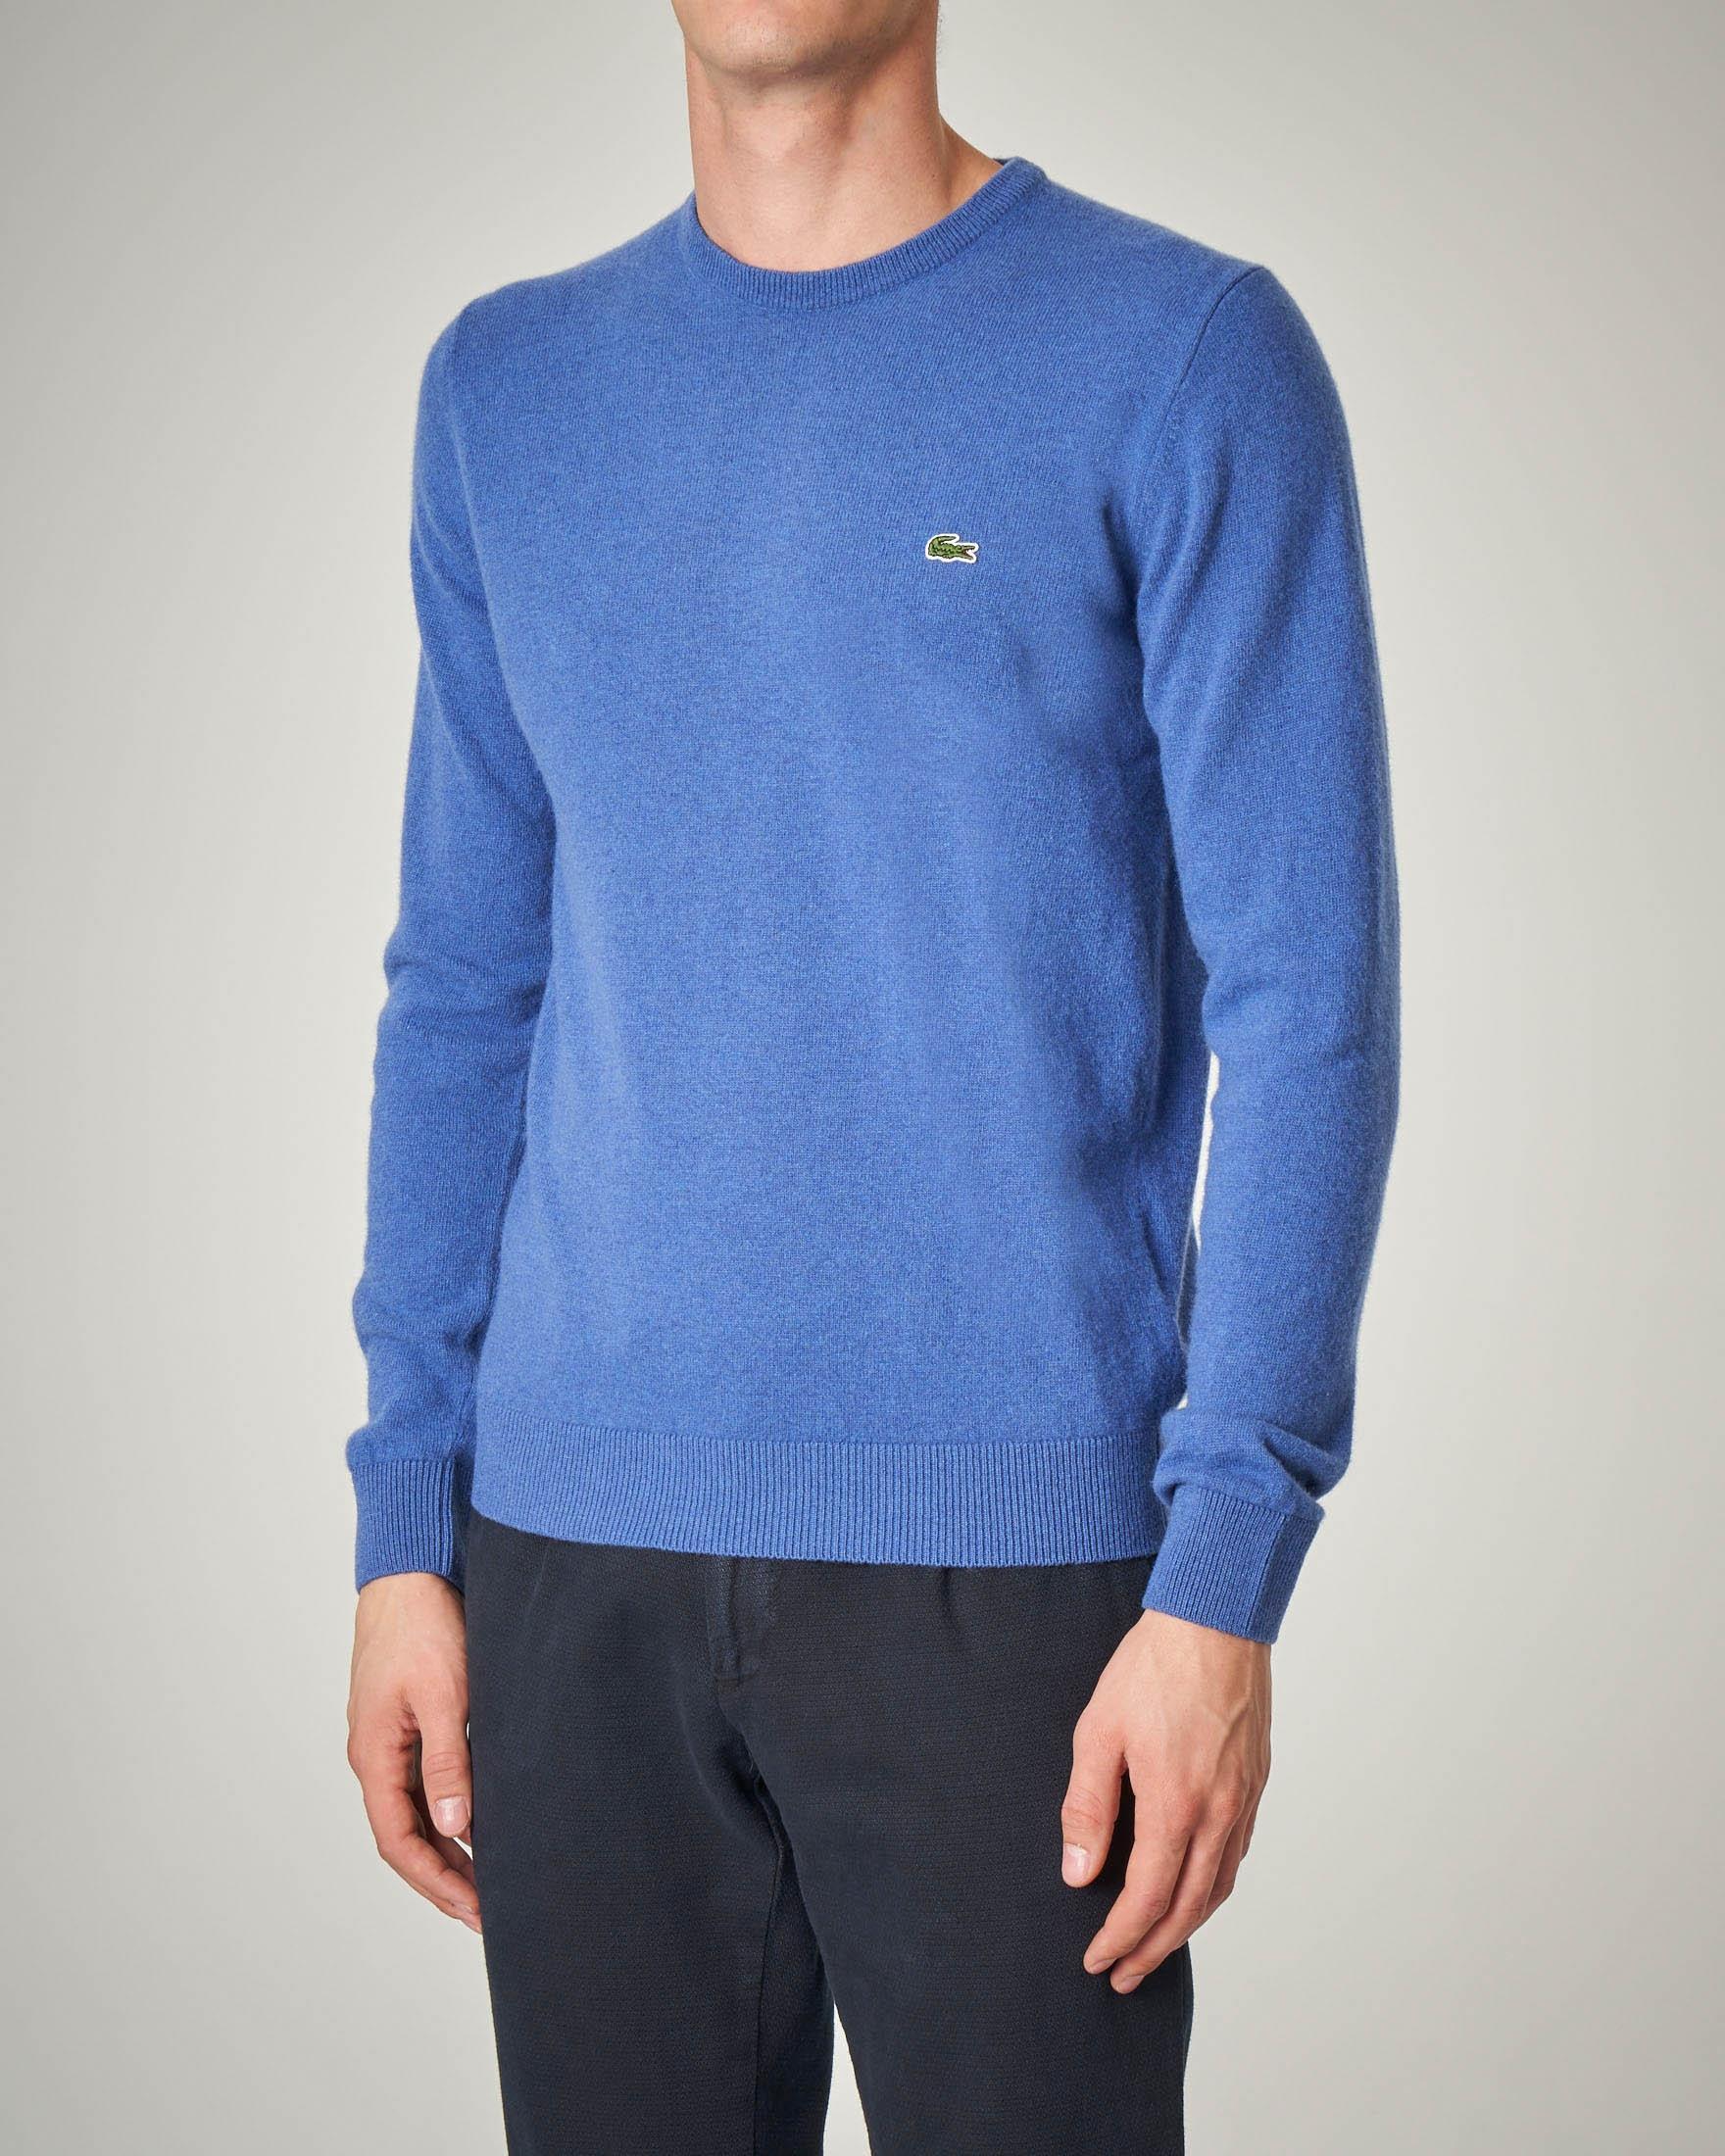 Maglia azzurra girocollo in lana